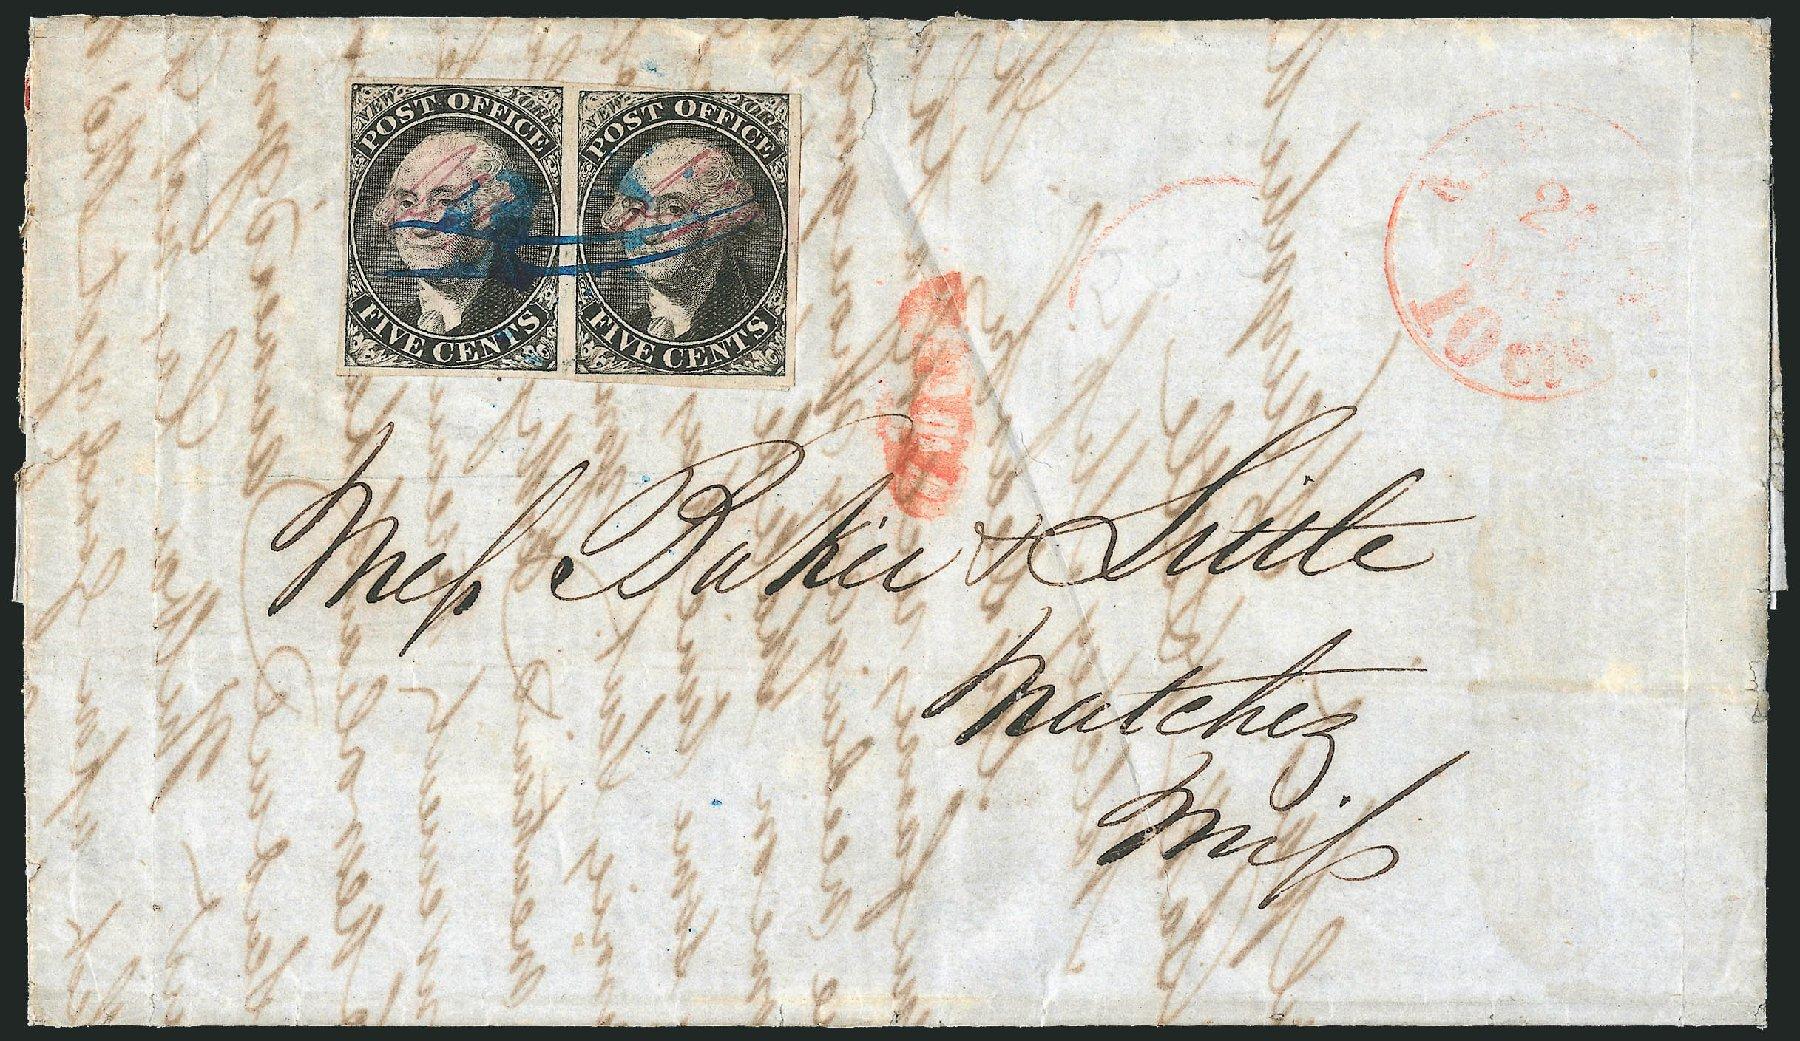 US Stamps Value Scott Catalogue #9X1: 5c 1846 New York Postmasters Provisional. Robert Siegel Auction Galleries, Dec 2014, Sale 1090, Lot 1085